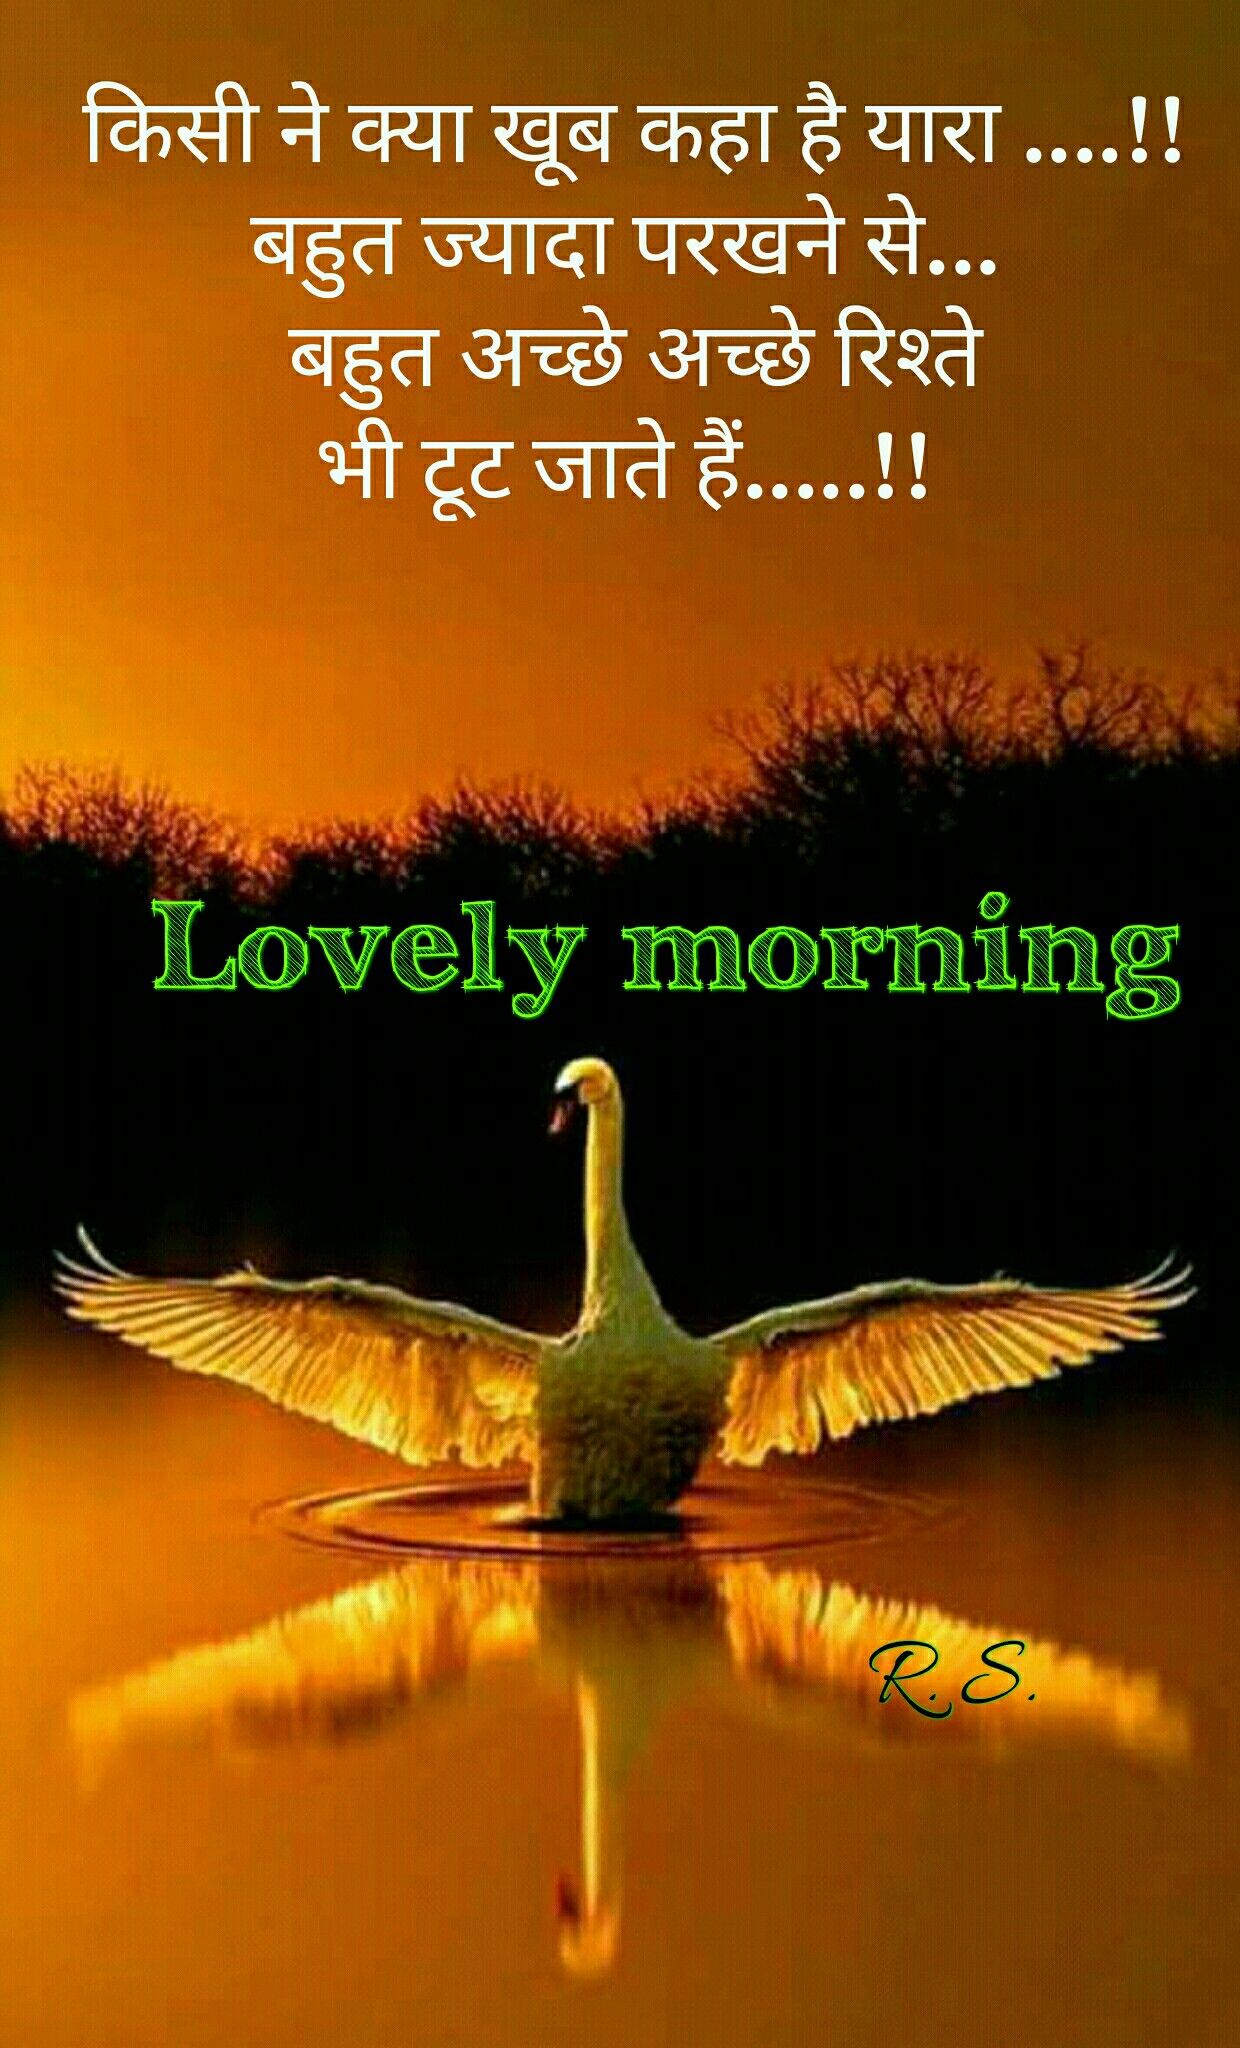 Pin By Pratiksha On Good Morning Good Morning Picture Good Morning Meme Morning Prayer Quotes